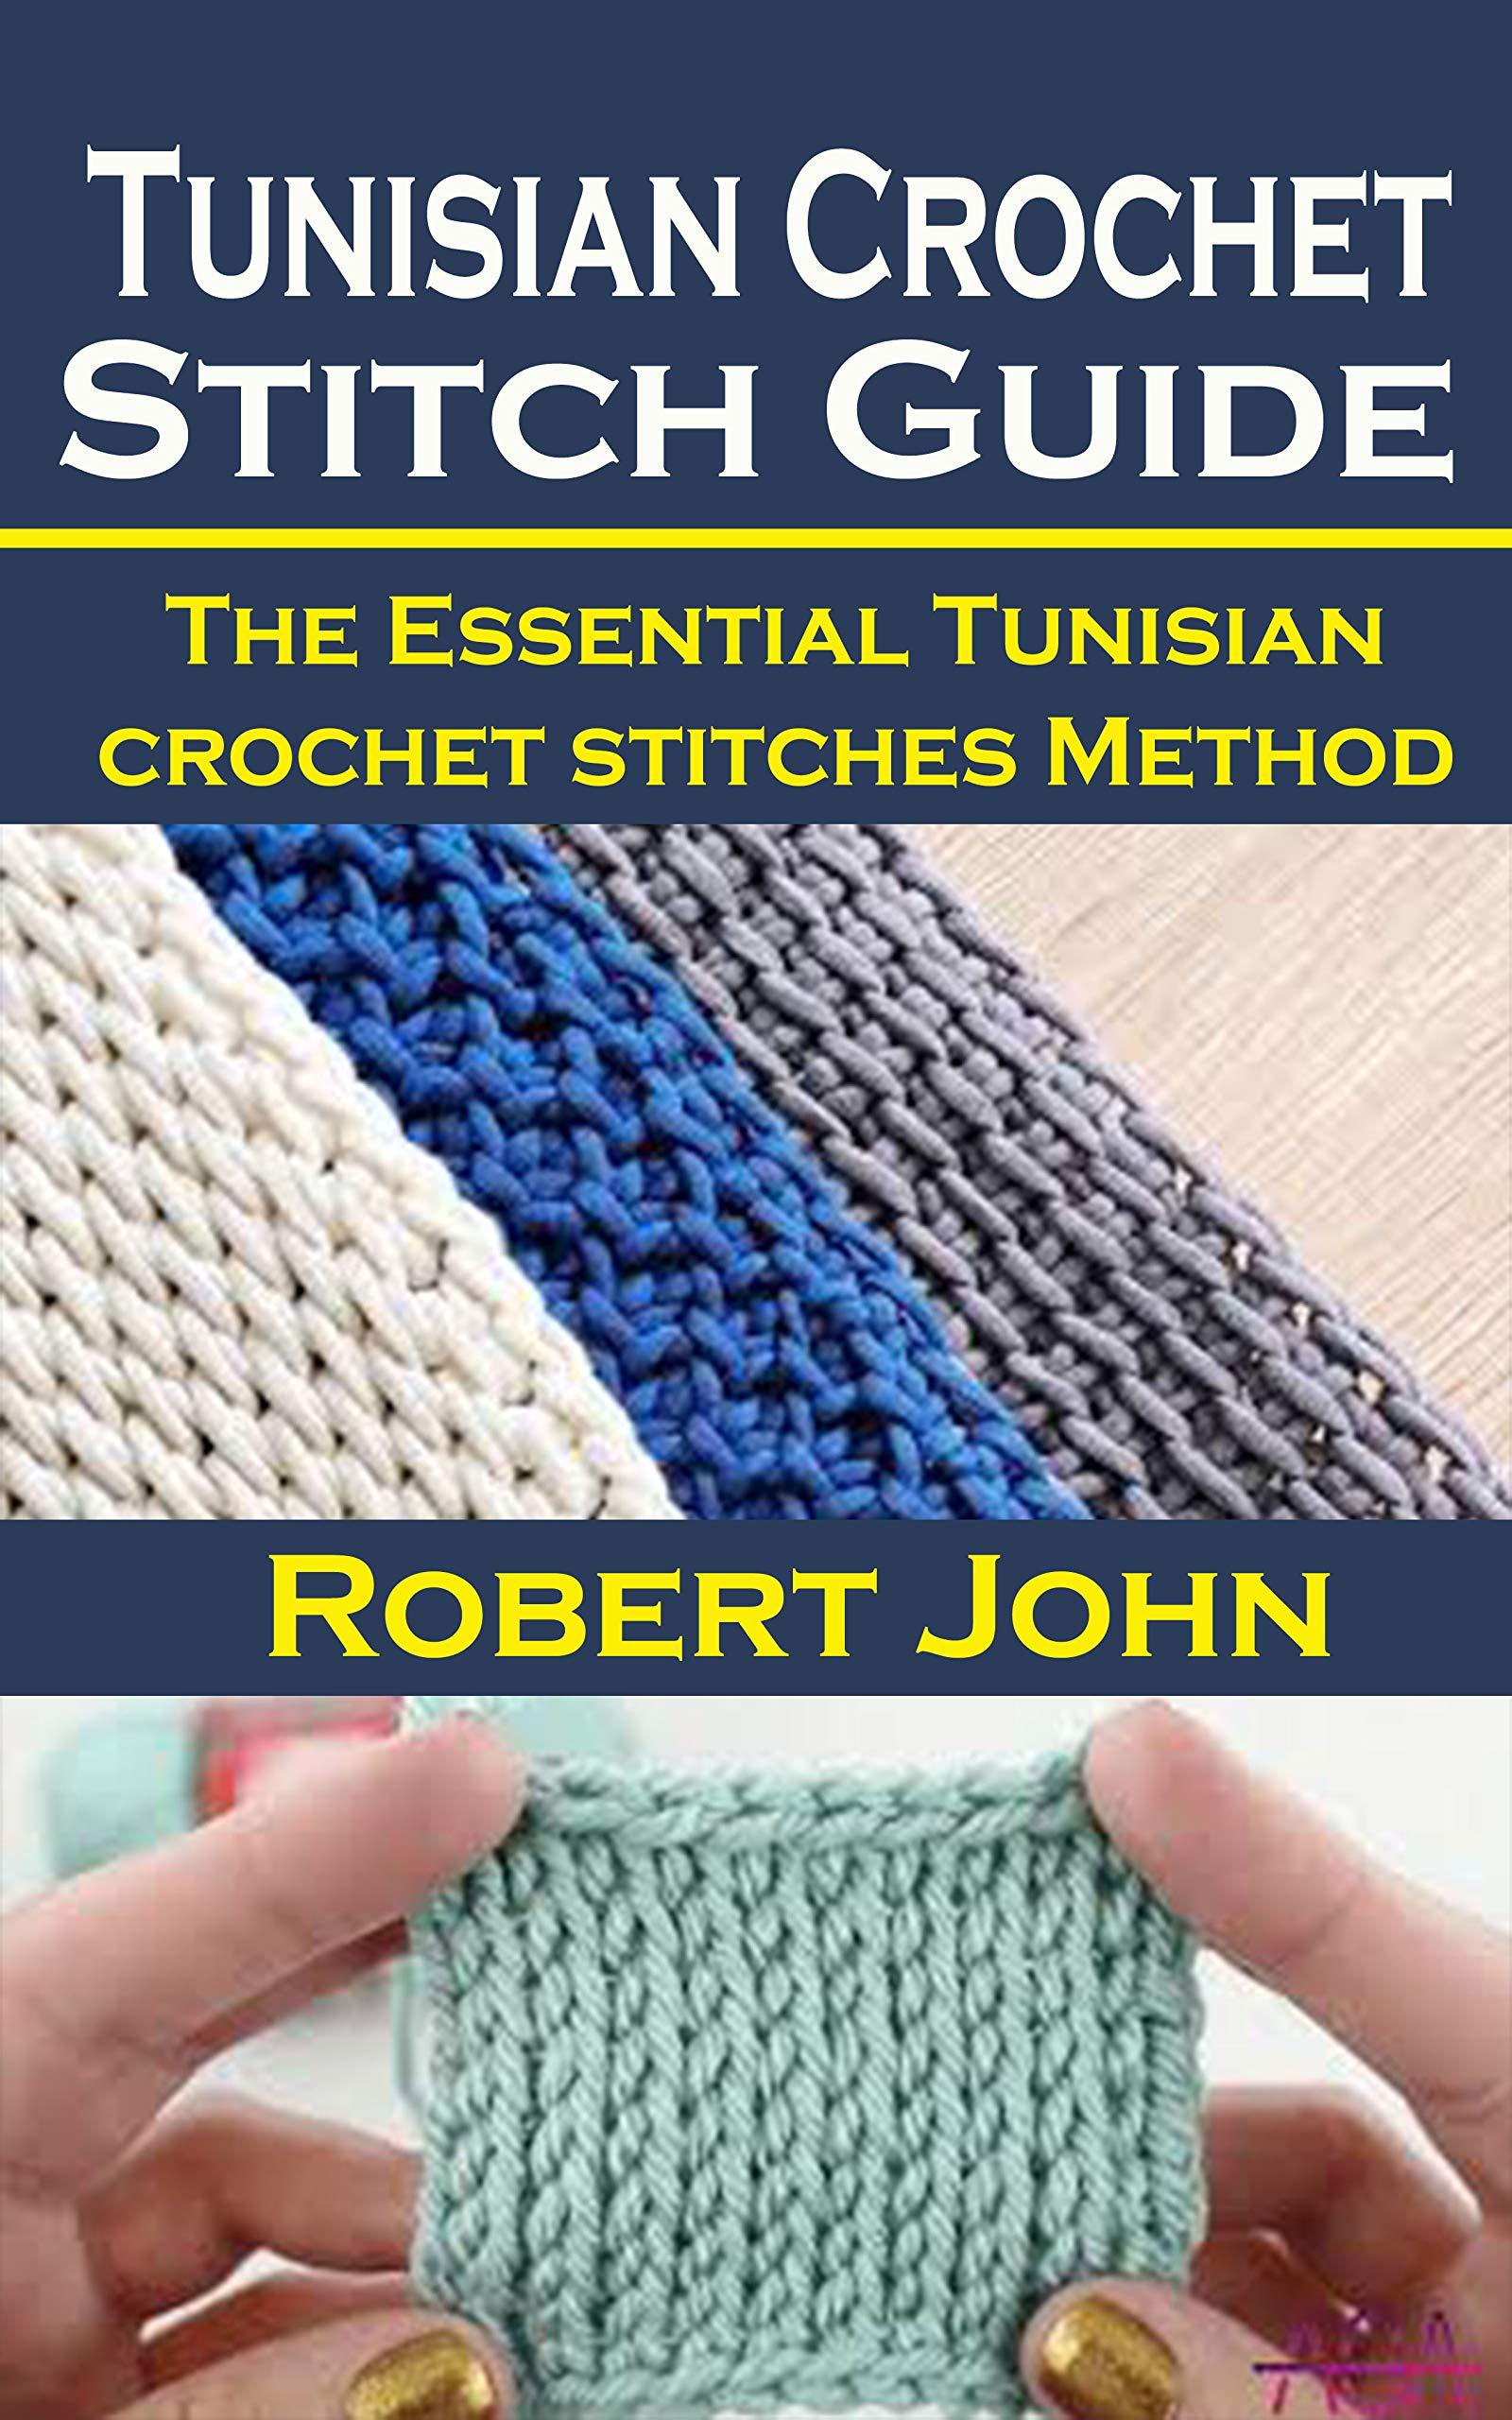 Tunisian Crochet Stitch Guide: Tunisian Crochet Stitch Guide: The Essential Tunisian crochet stitches Method